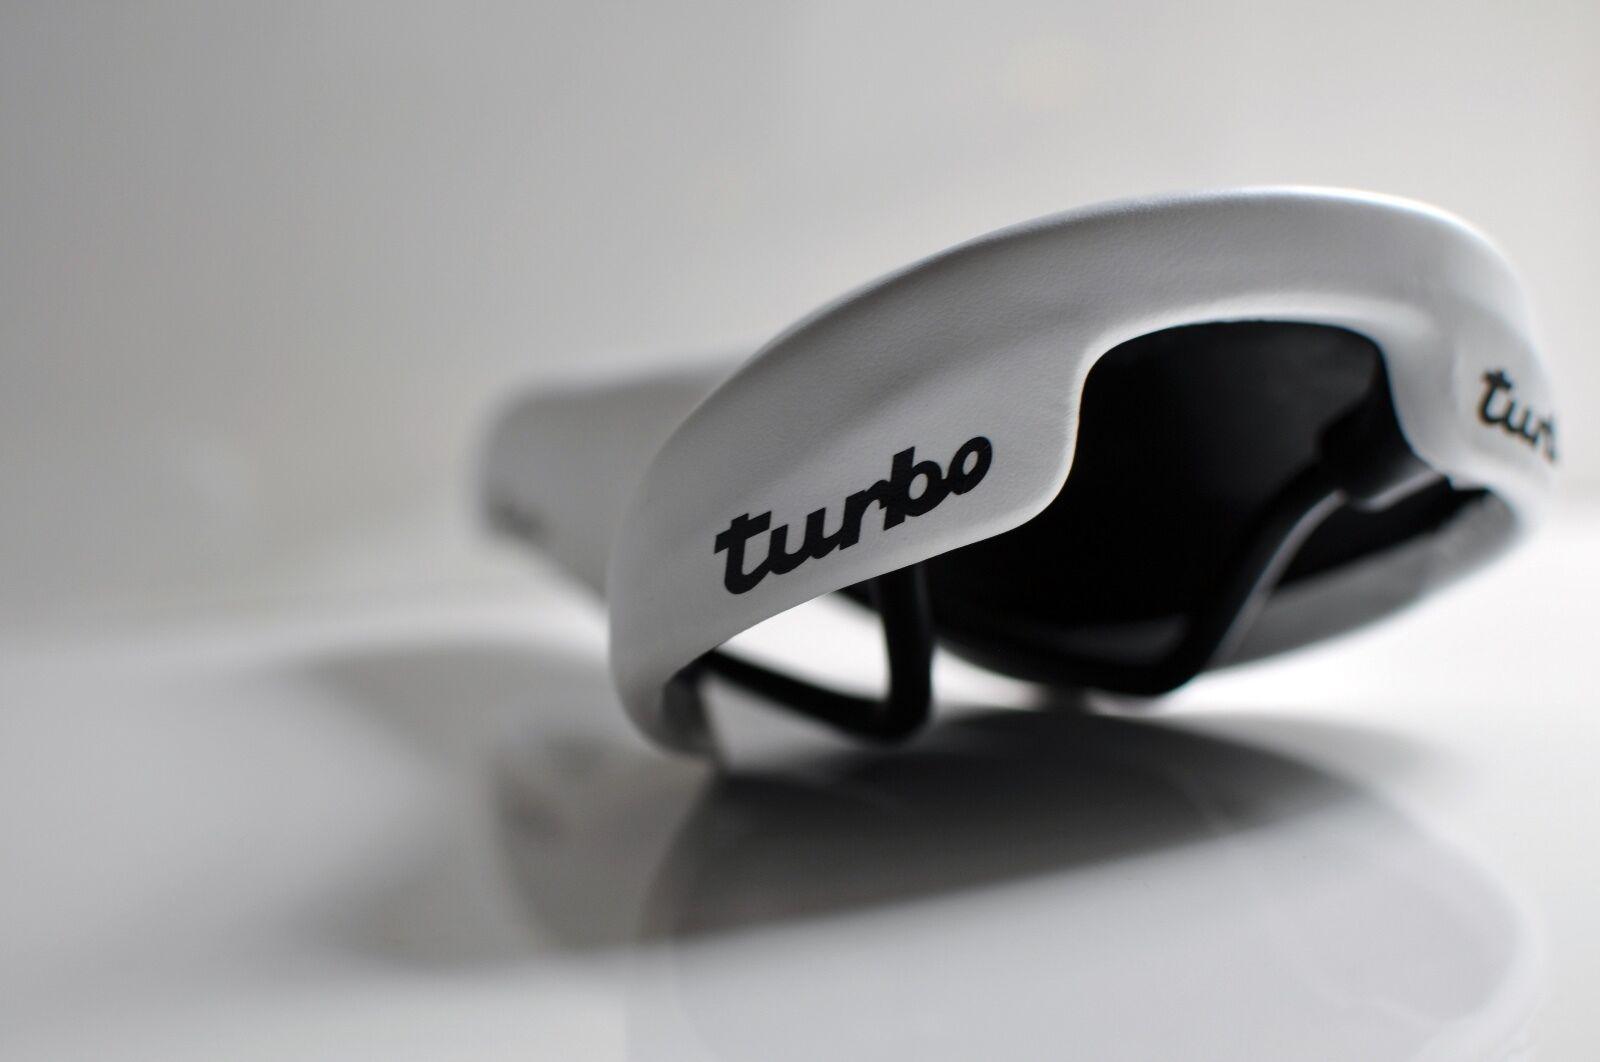 Selle  Italia Turbo white saddle made in   100% free shipping